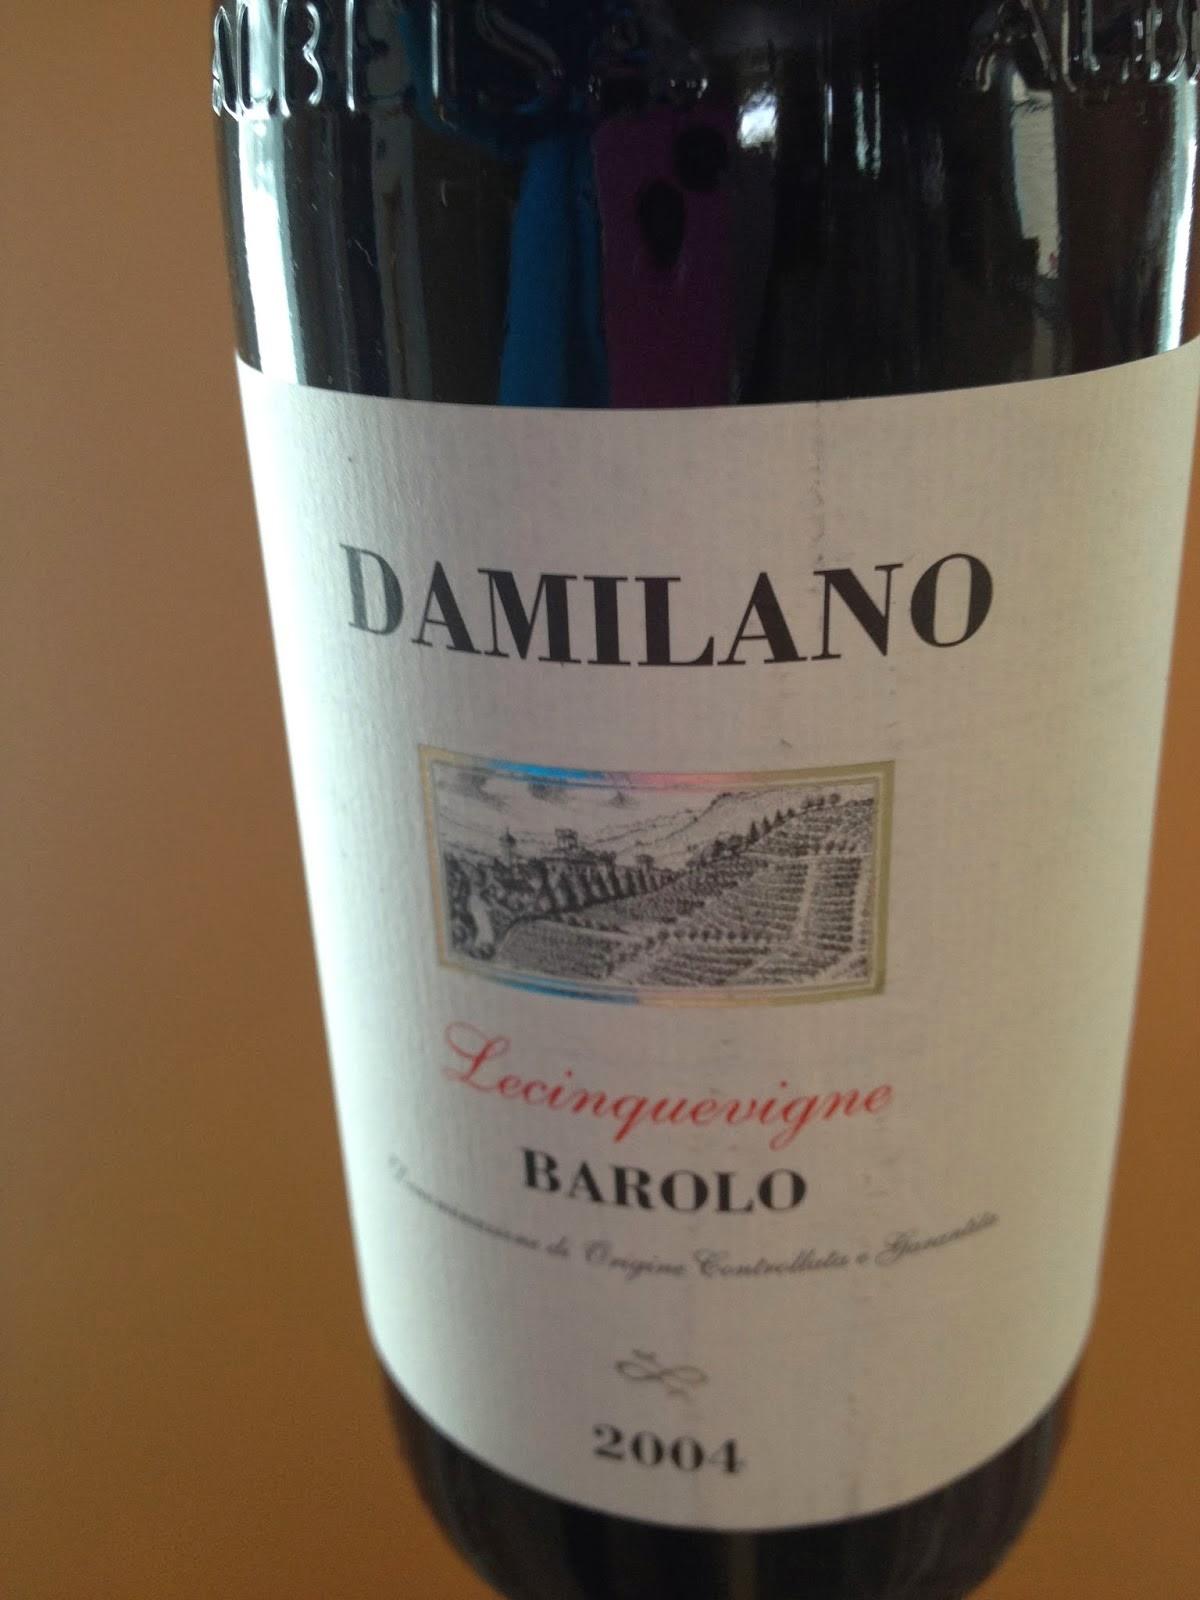 2004 Damilano Lecinquevigne Barolo